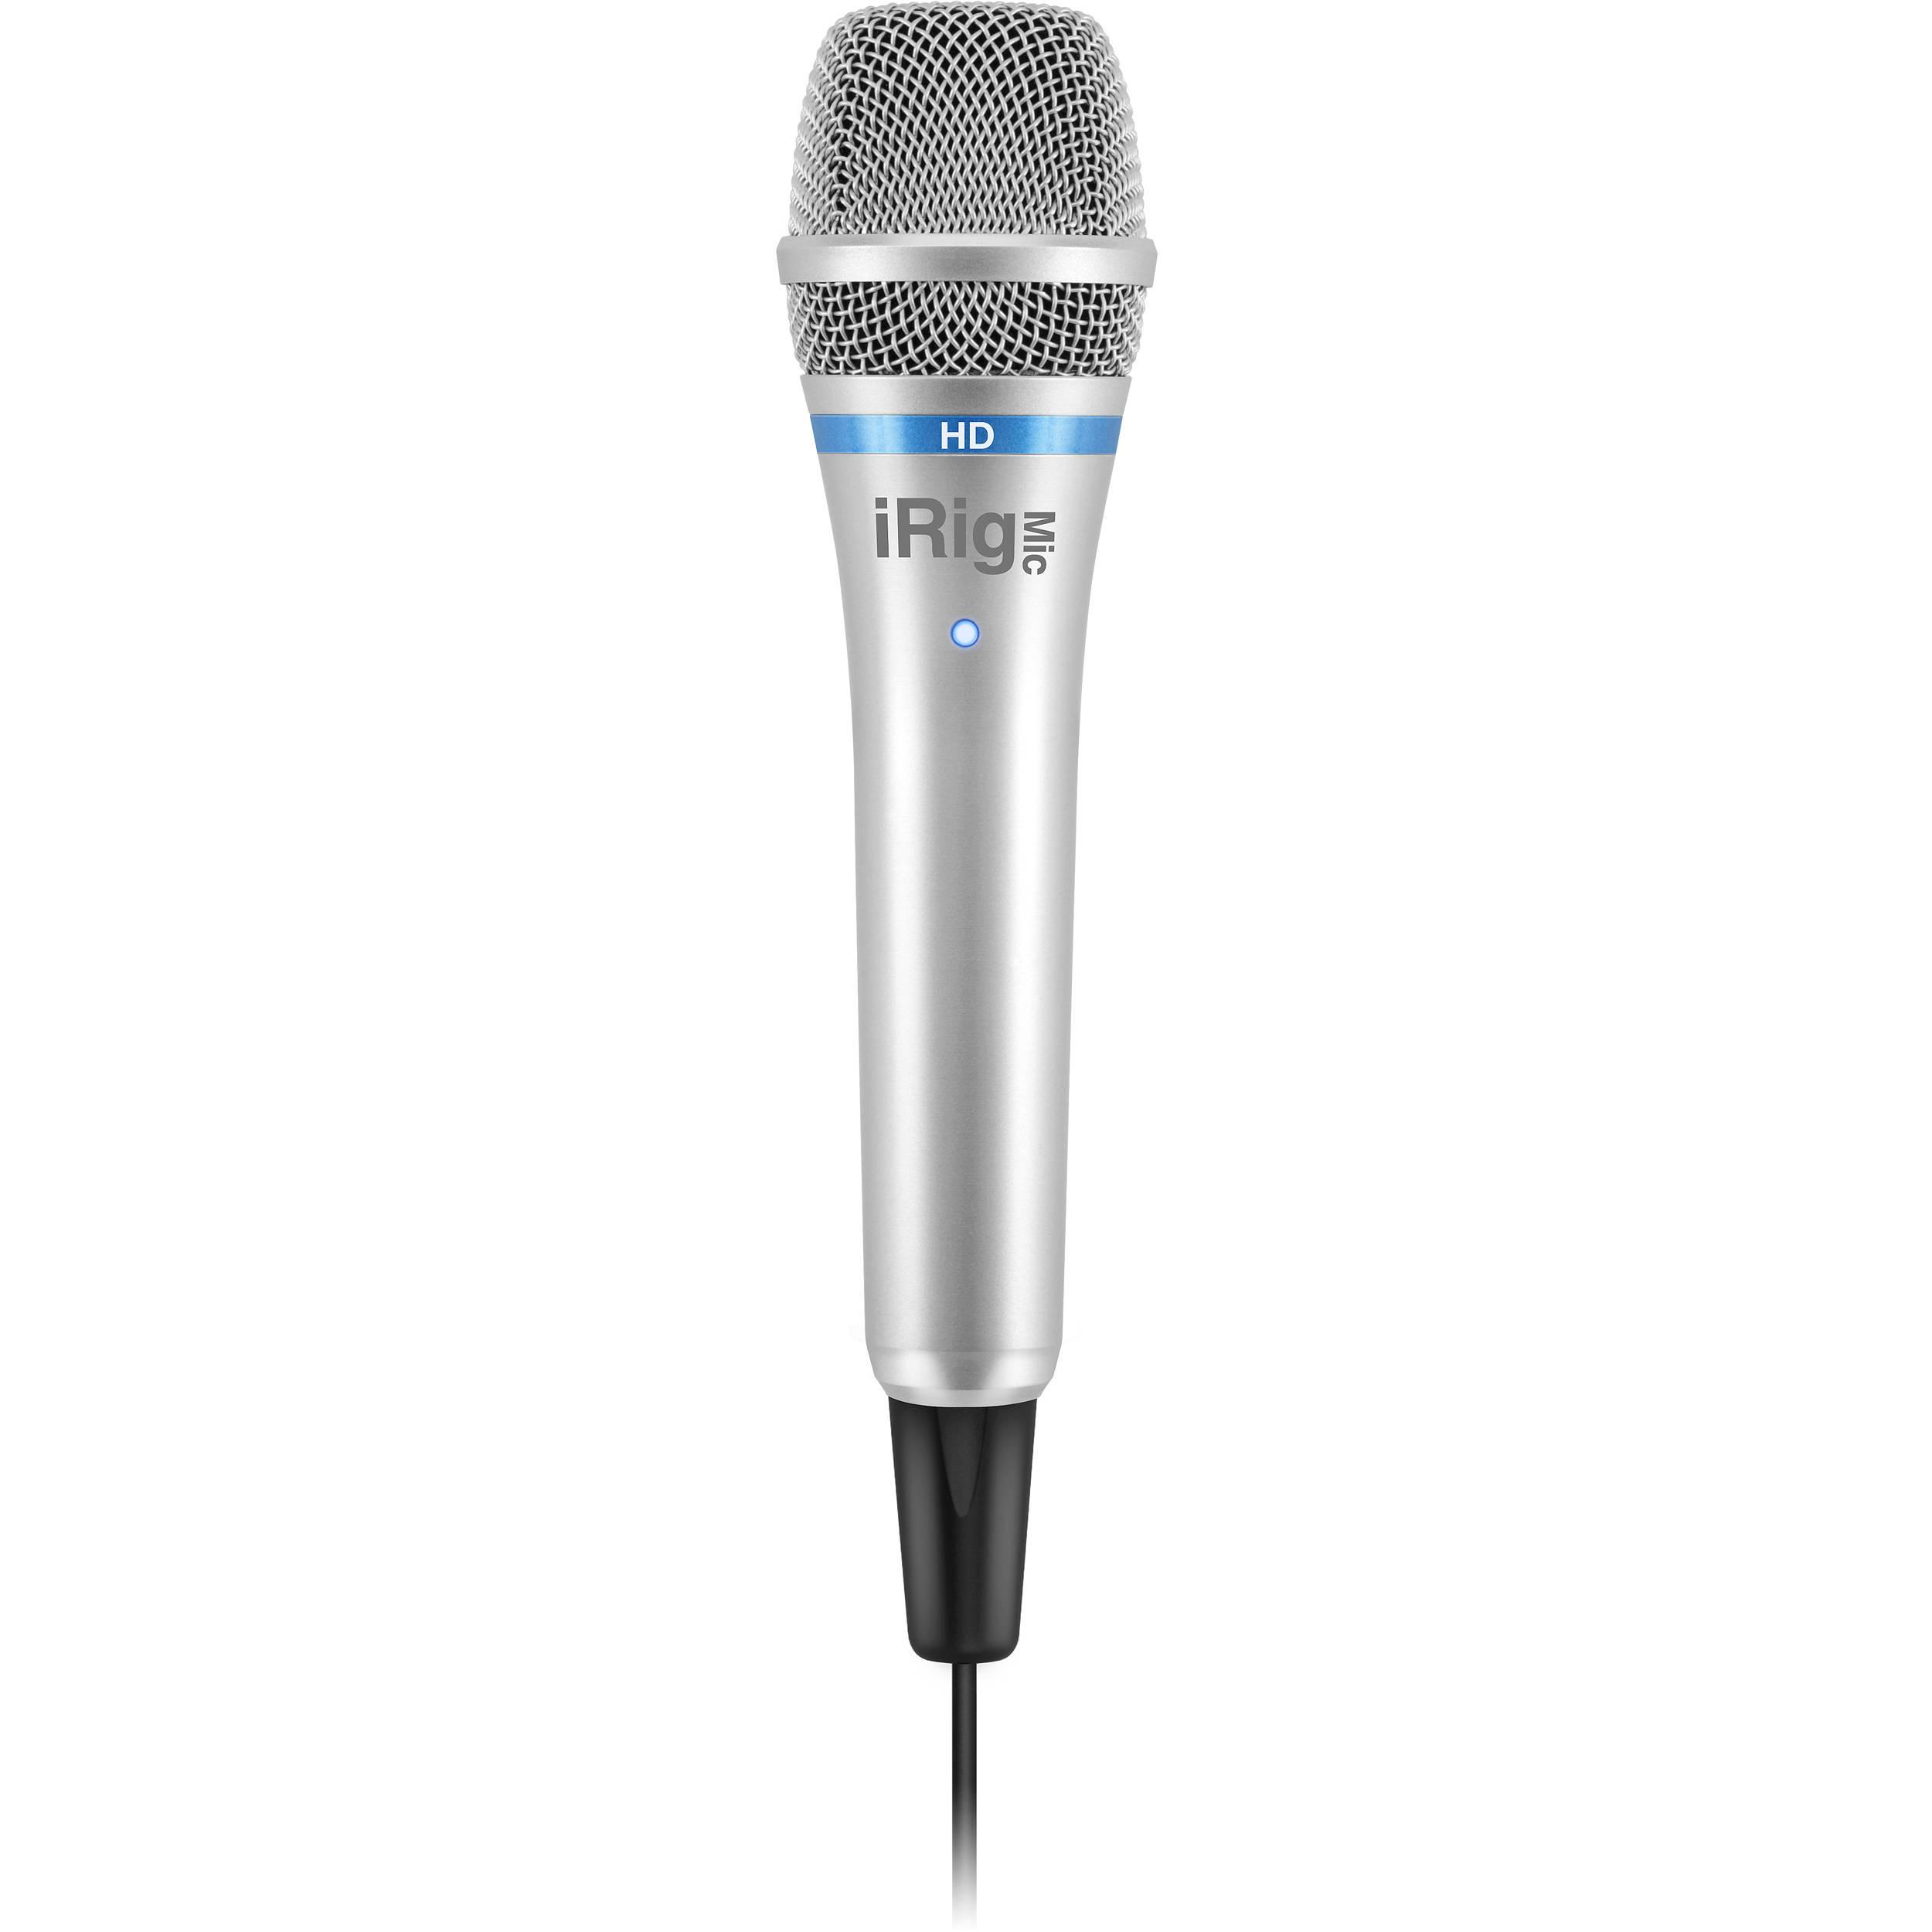 IK Multimedia iRig Mic HD Digital Condenser Microphone for iOS/Mac/Windows  (Silver)